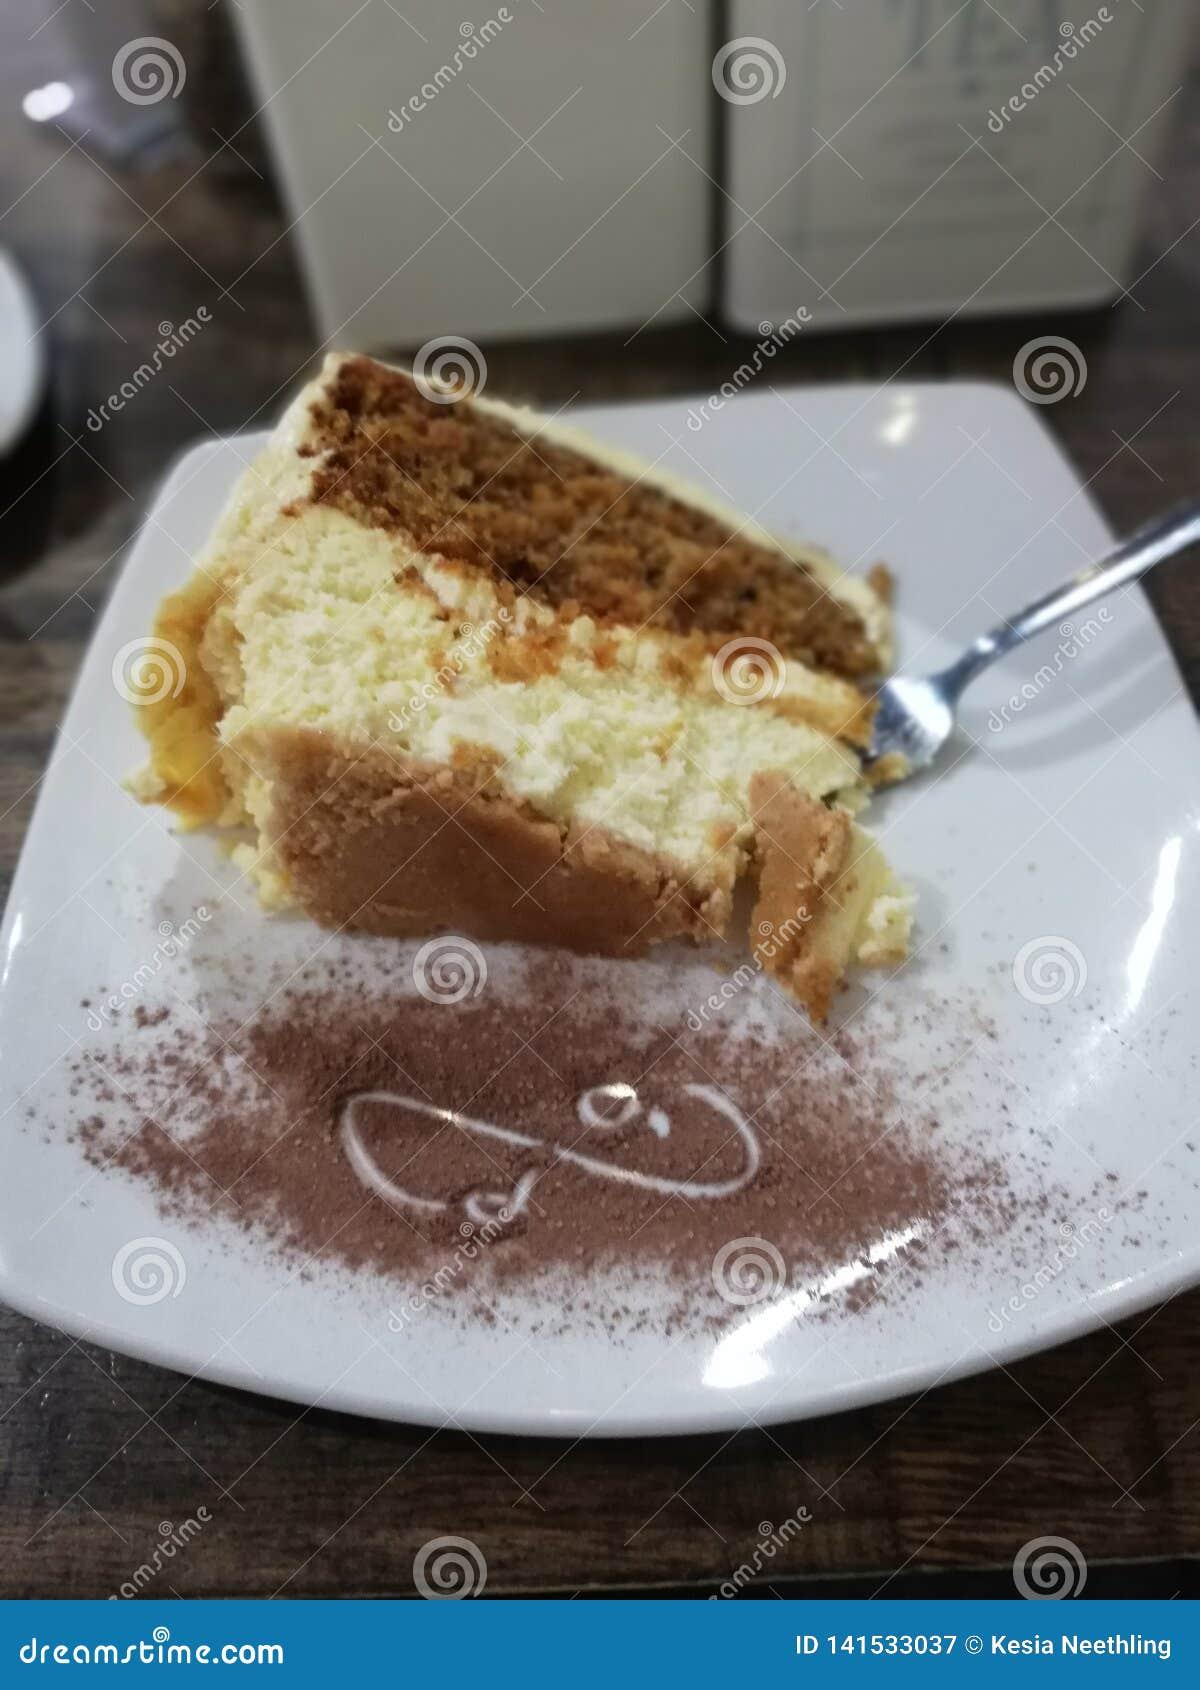 Carrotcheesecake teatime cheesecake urodzinowe marchewki